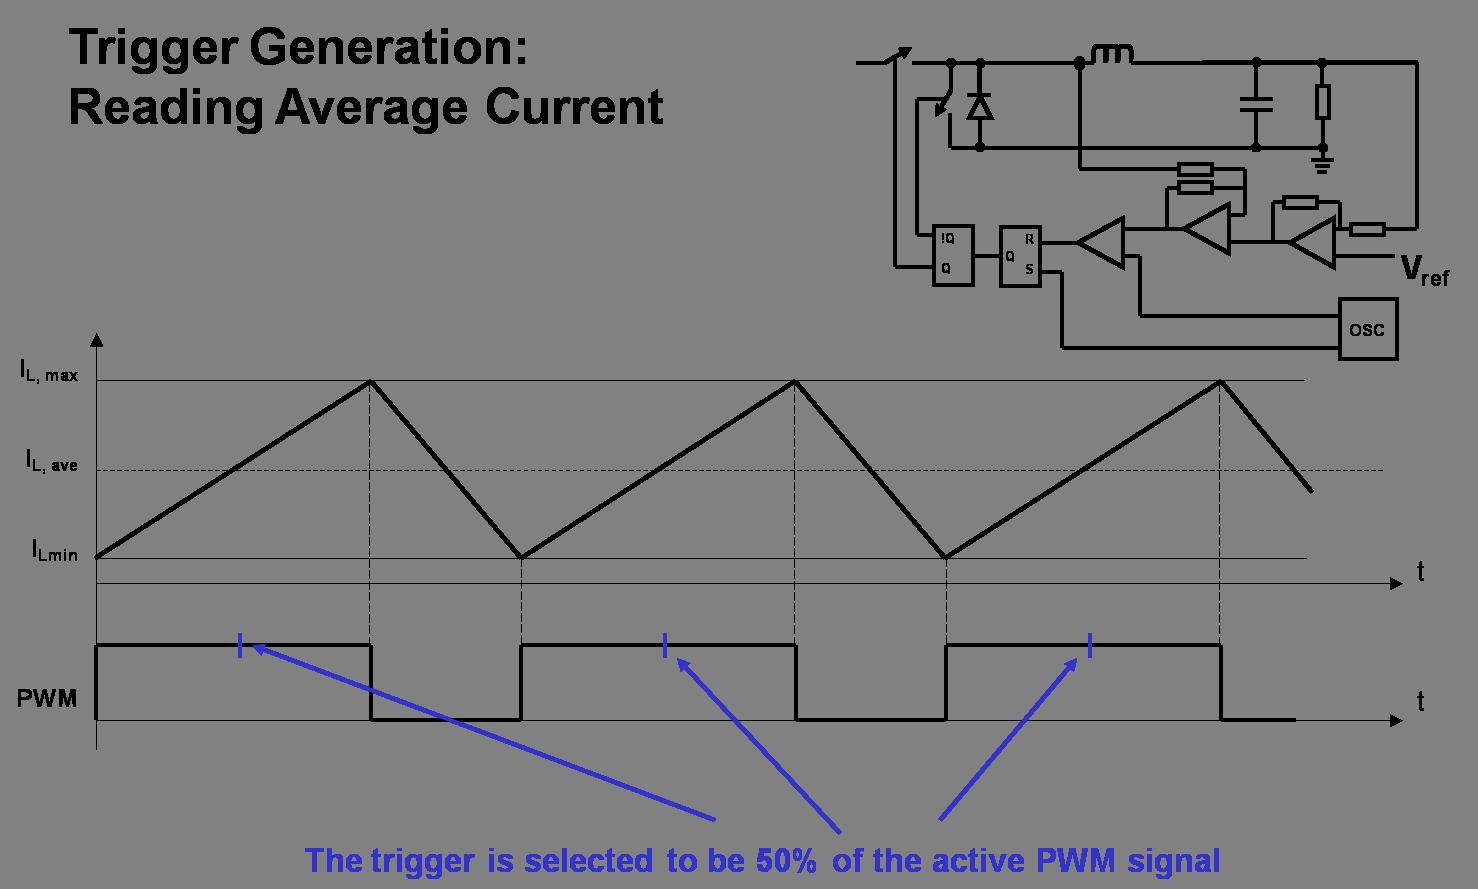 ipp-current-pwm.png